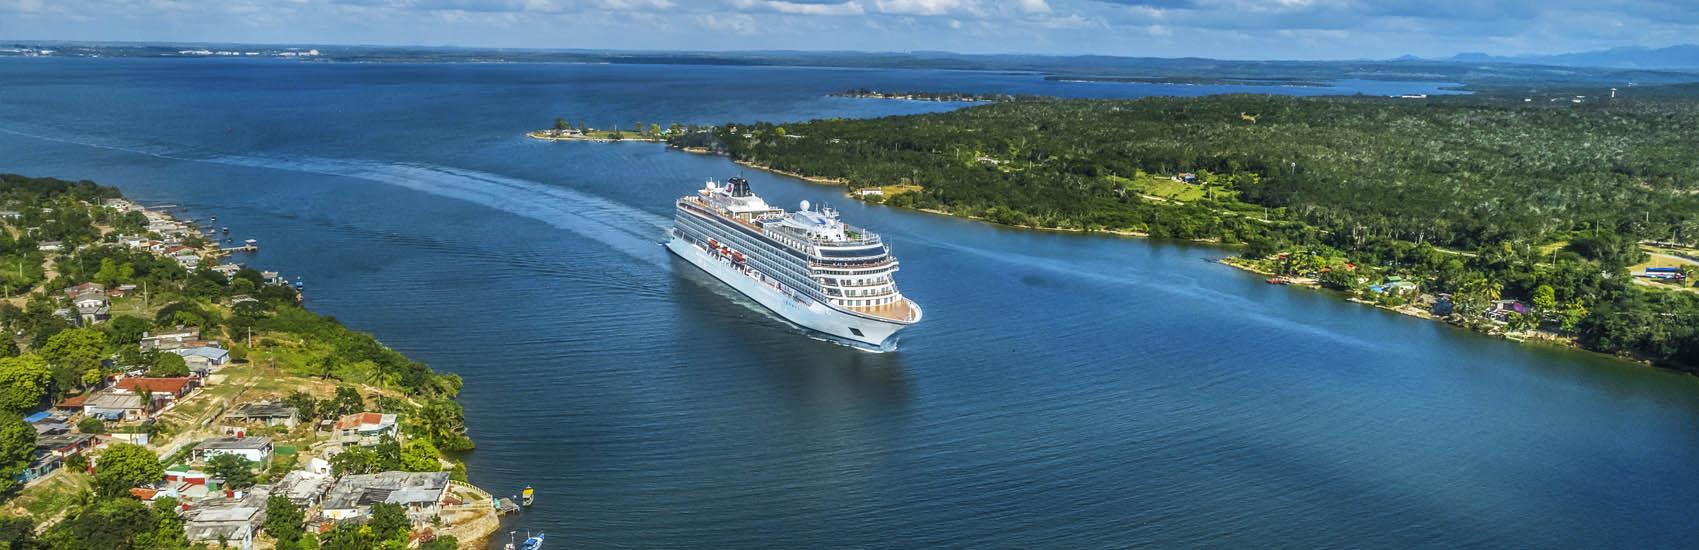 Save on your next Viking cruise